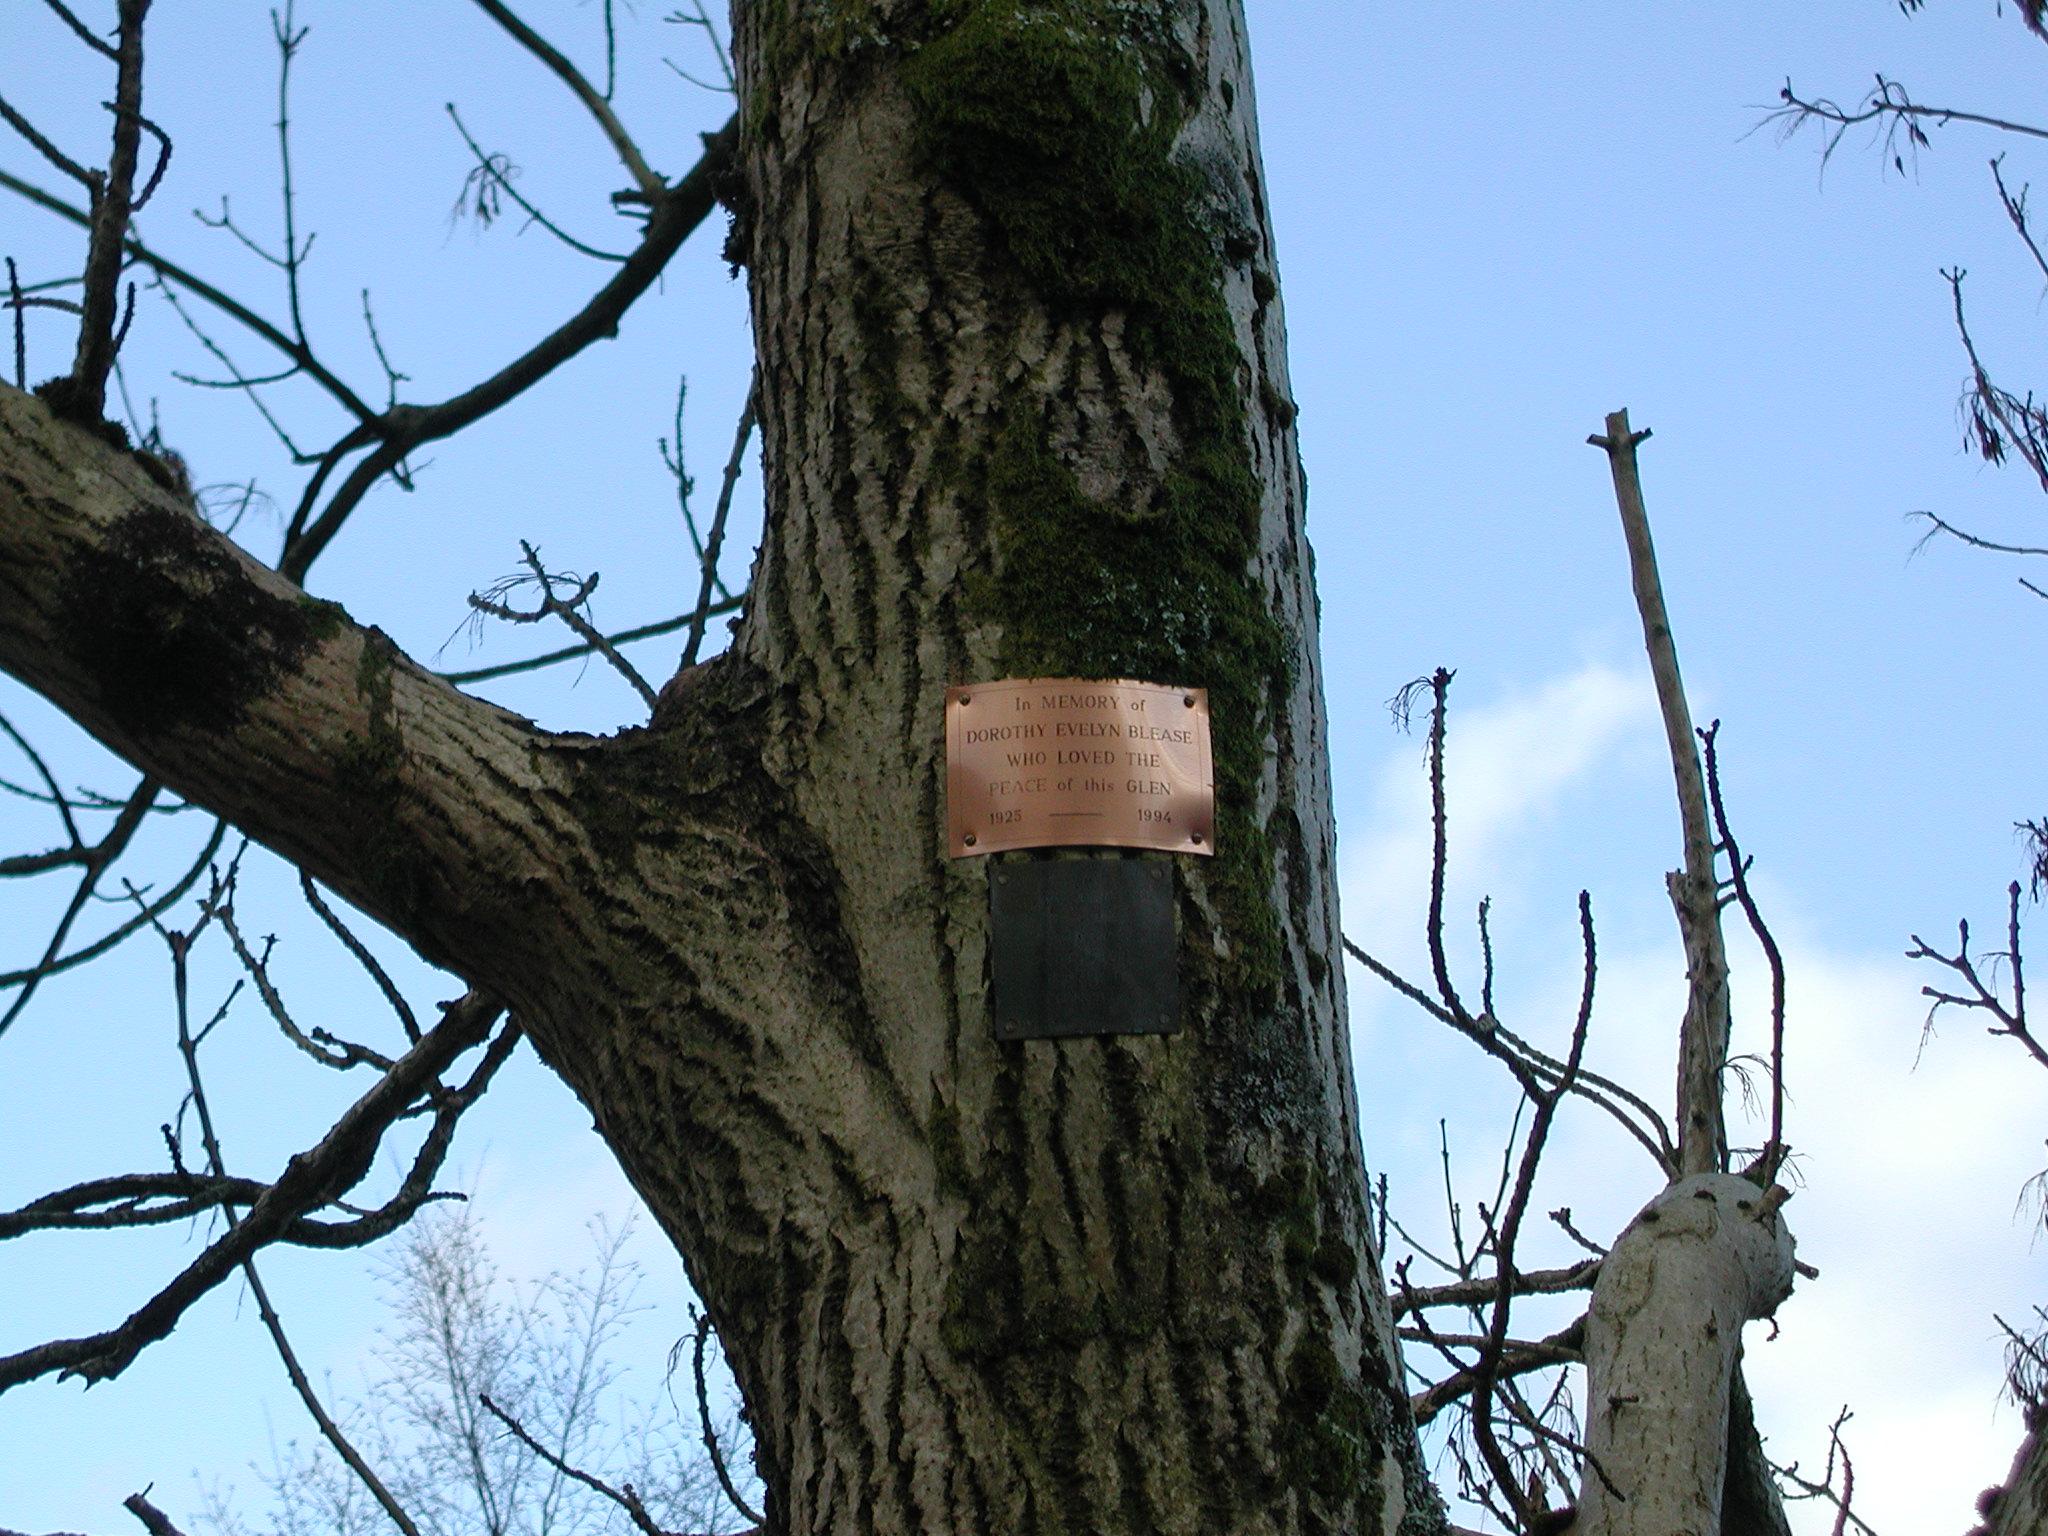 Memorial plack on tree at Inverchorachan fank